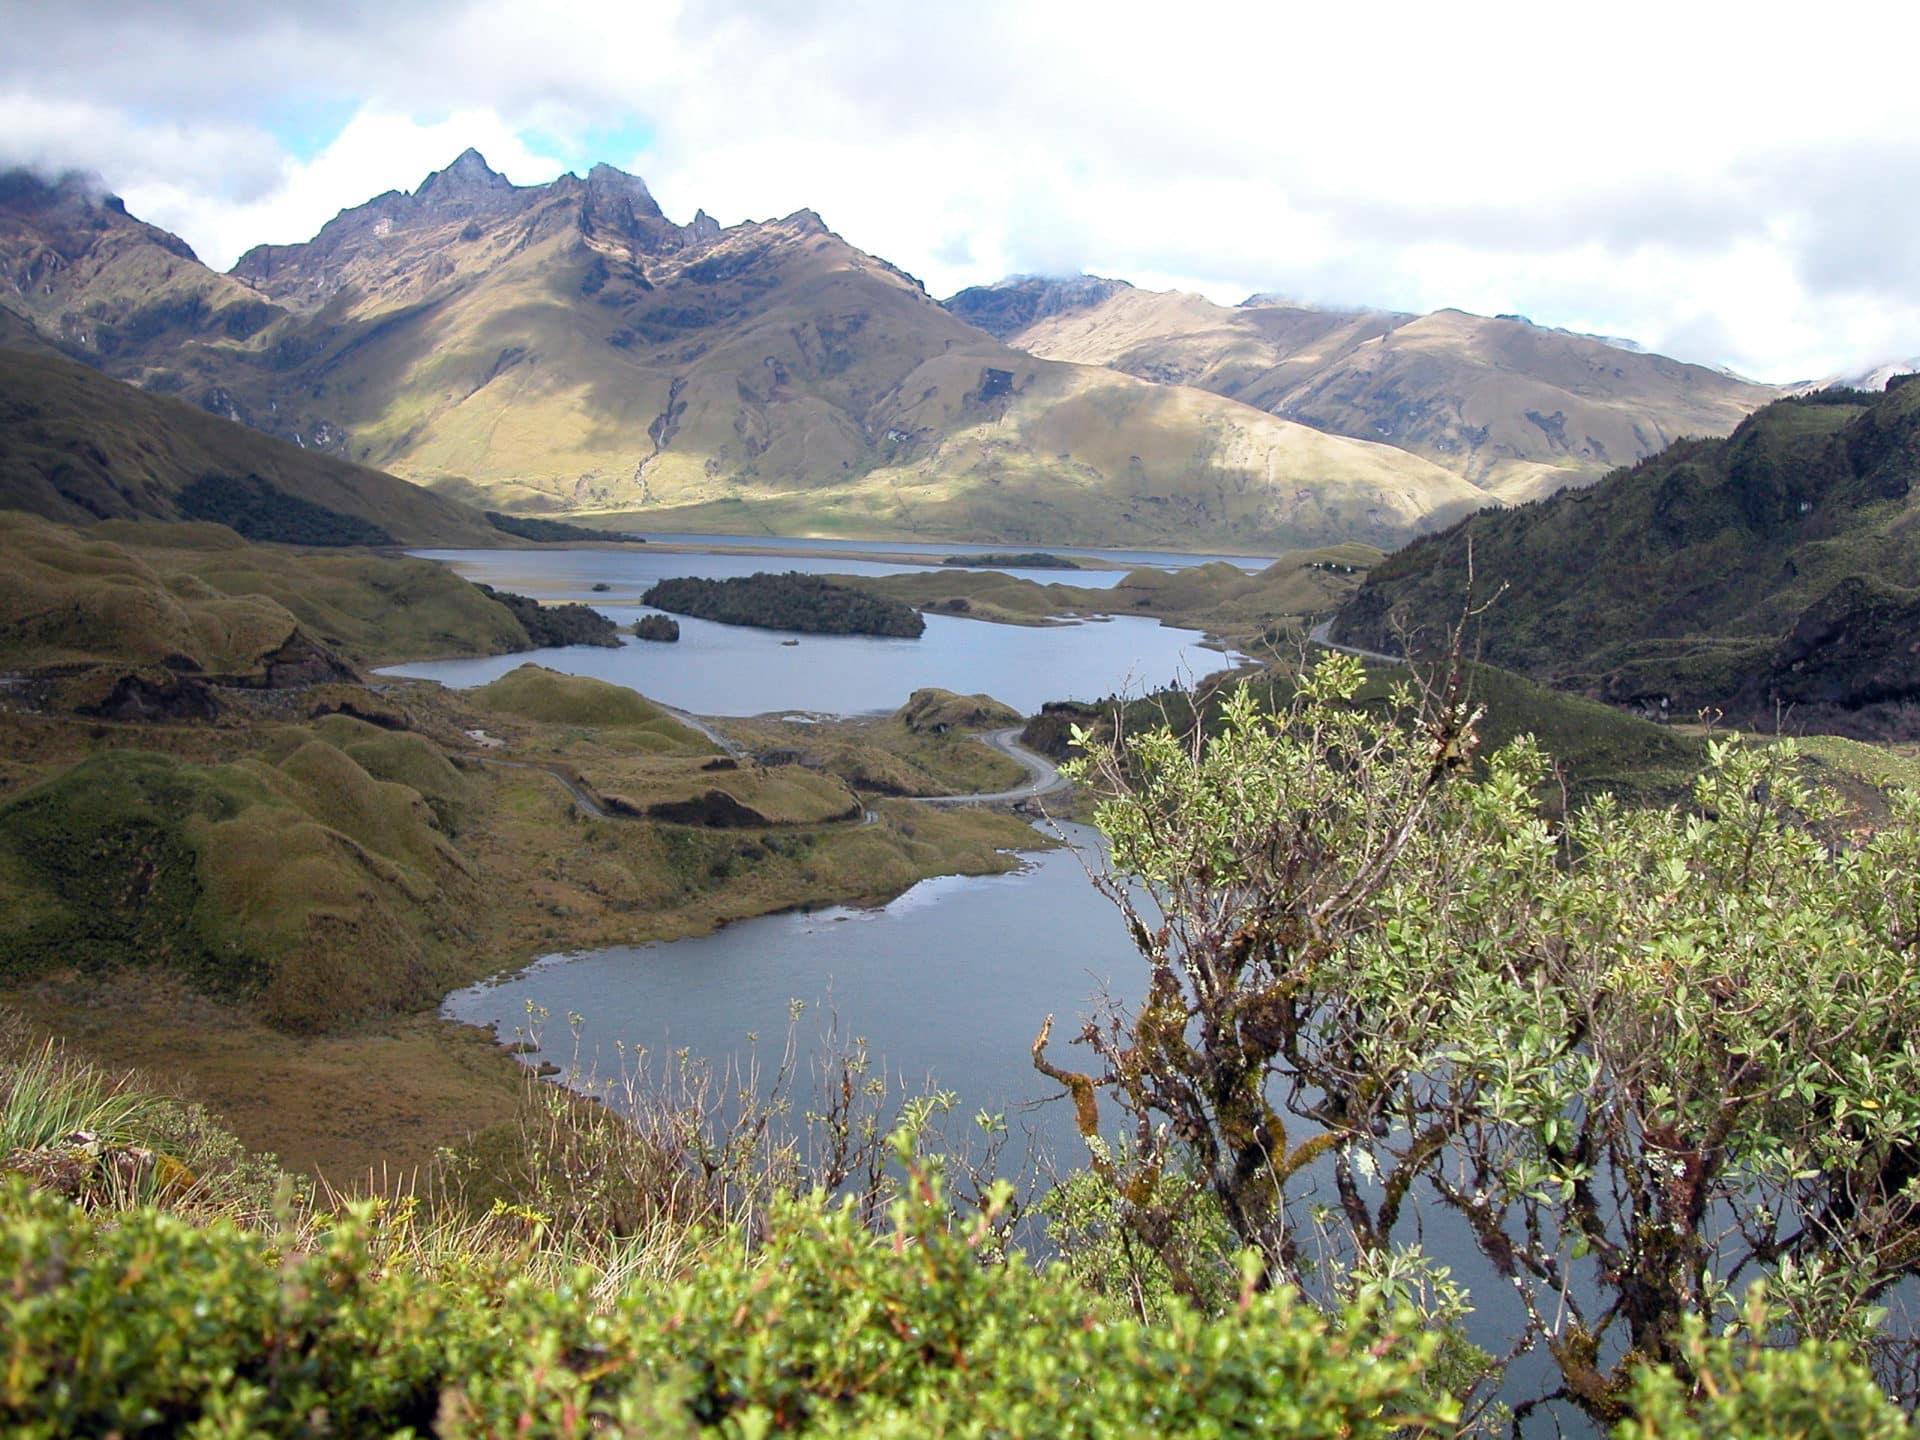 Sangay National Park 6-day guided trek in Ecuador